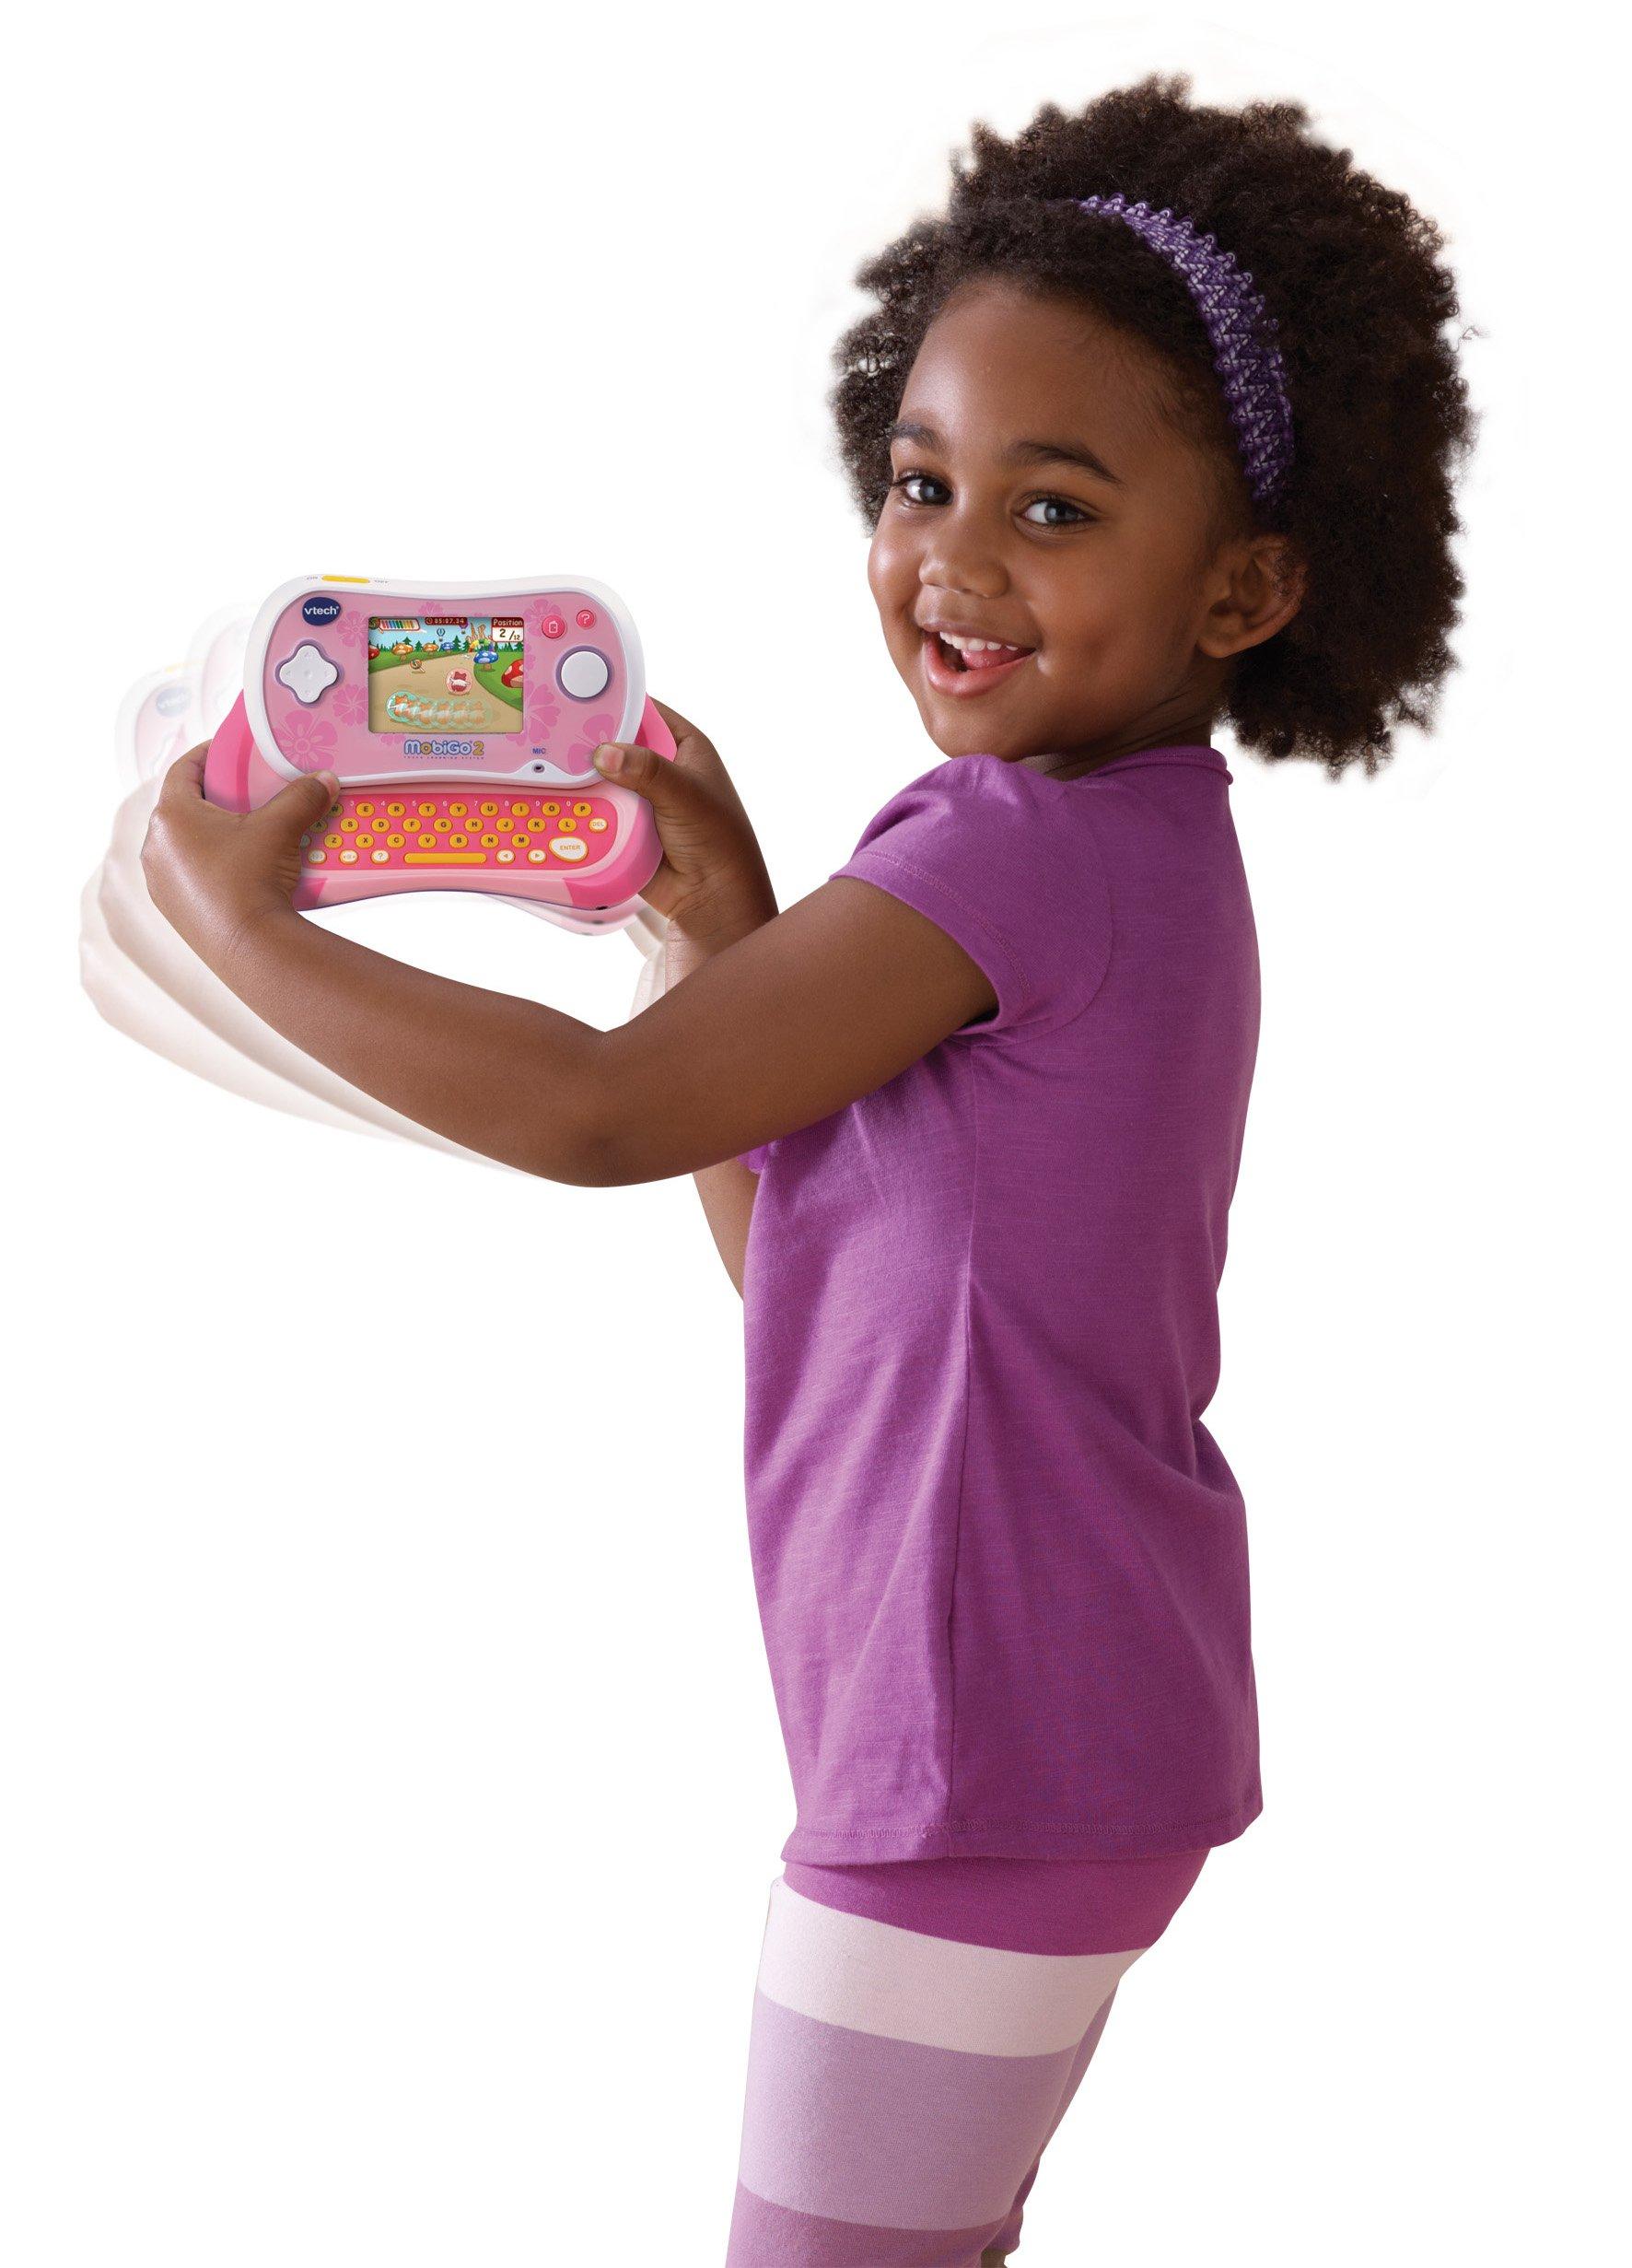 VTech MobiGo 2 Touch Learning System - Pink by VTech (Image #8)